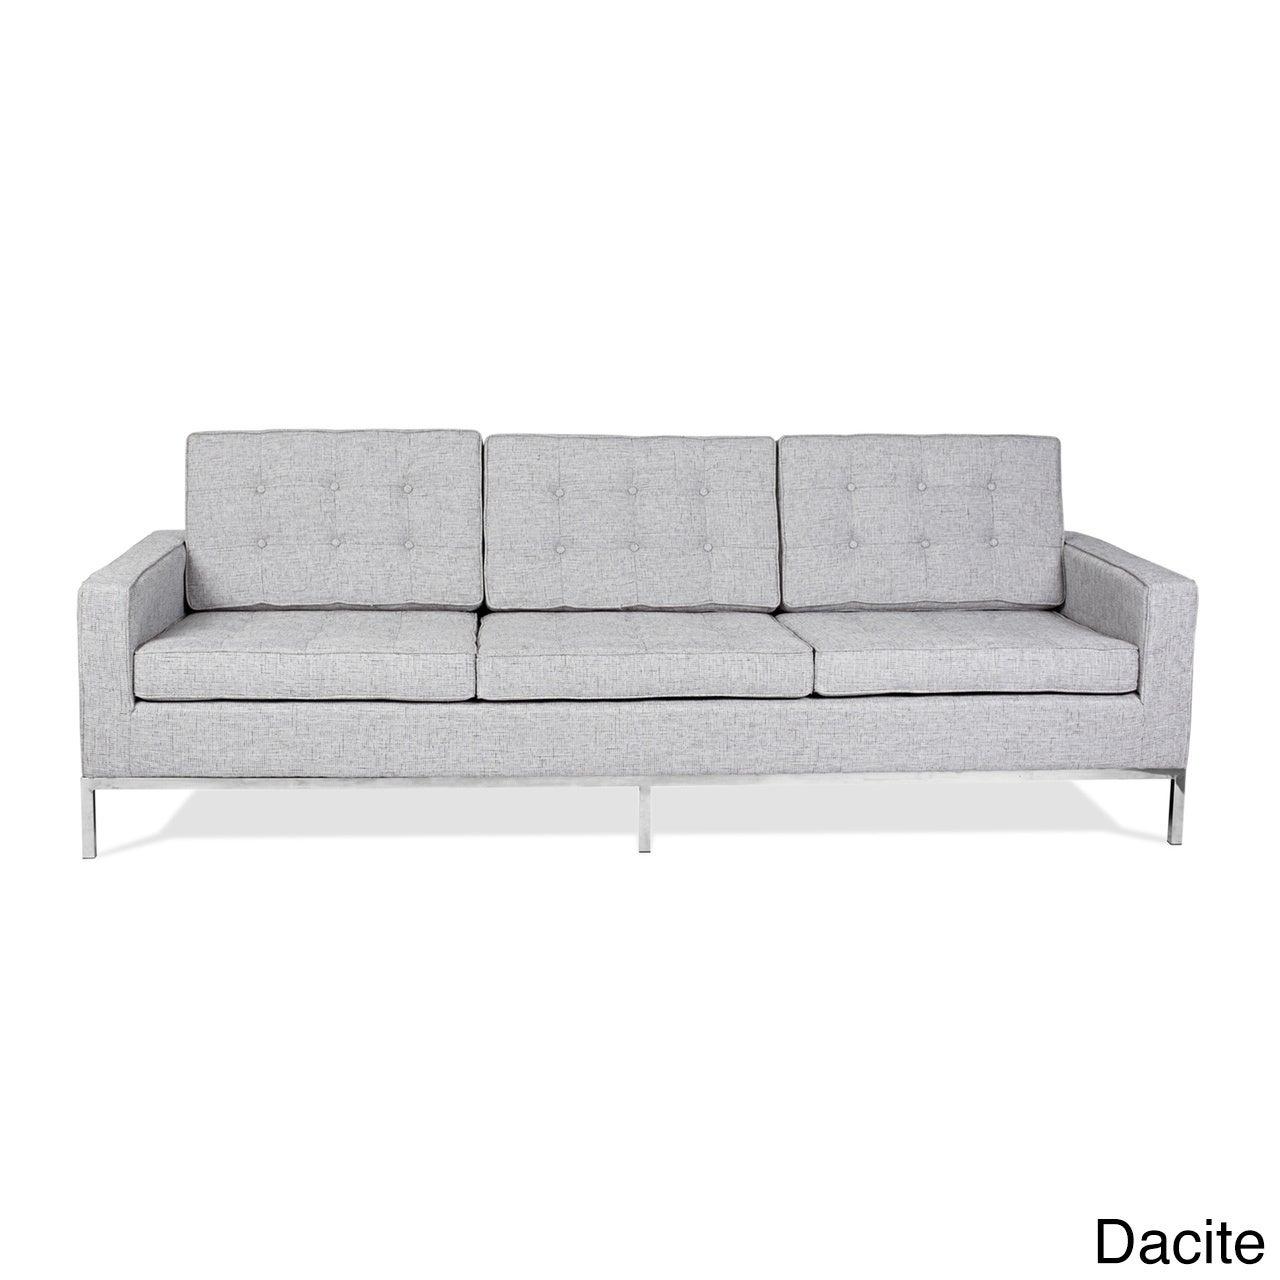 Kardiel Florence Knoll Style Sofa 3 Seat Premium